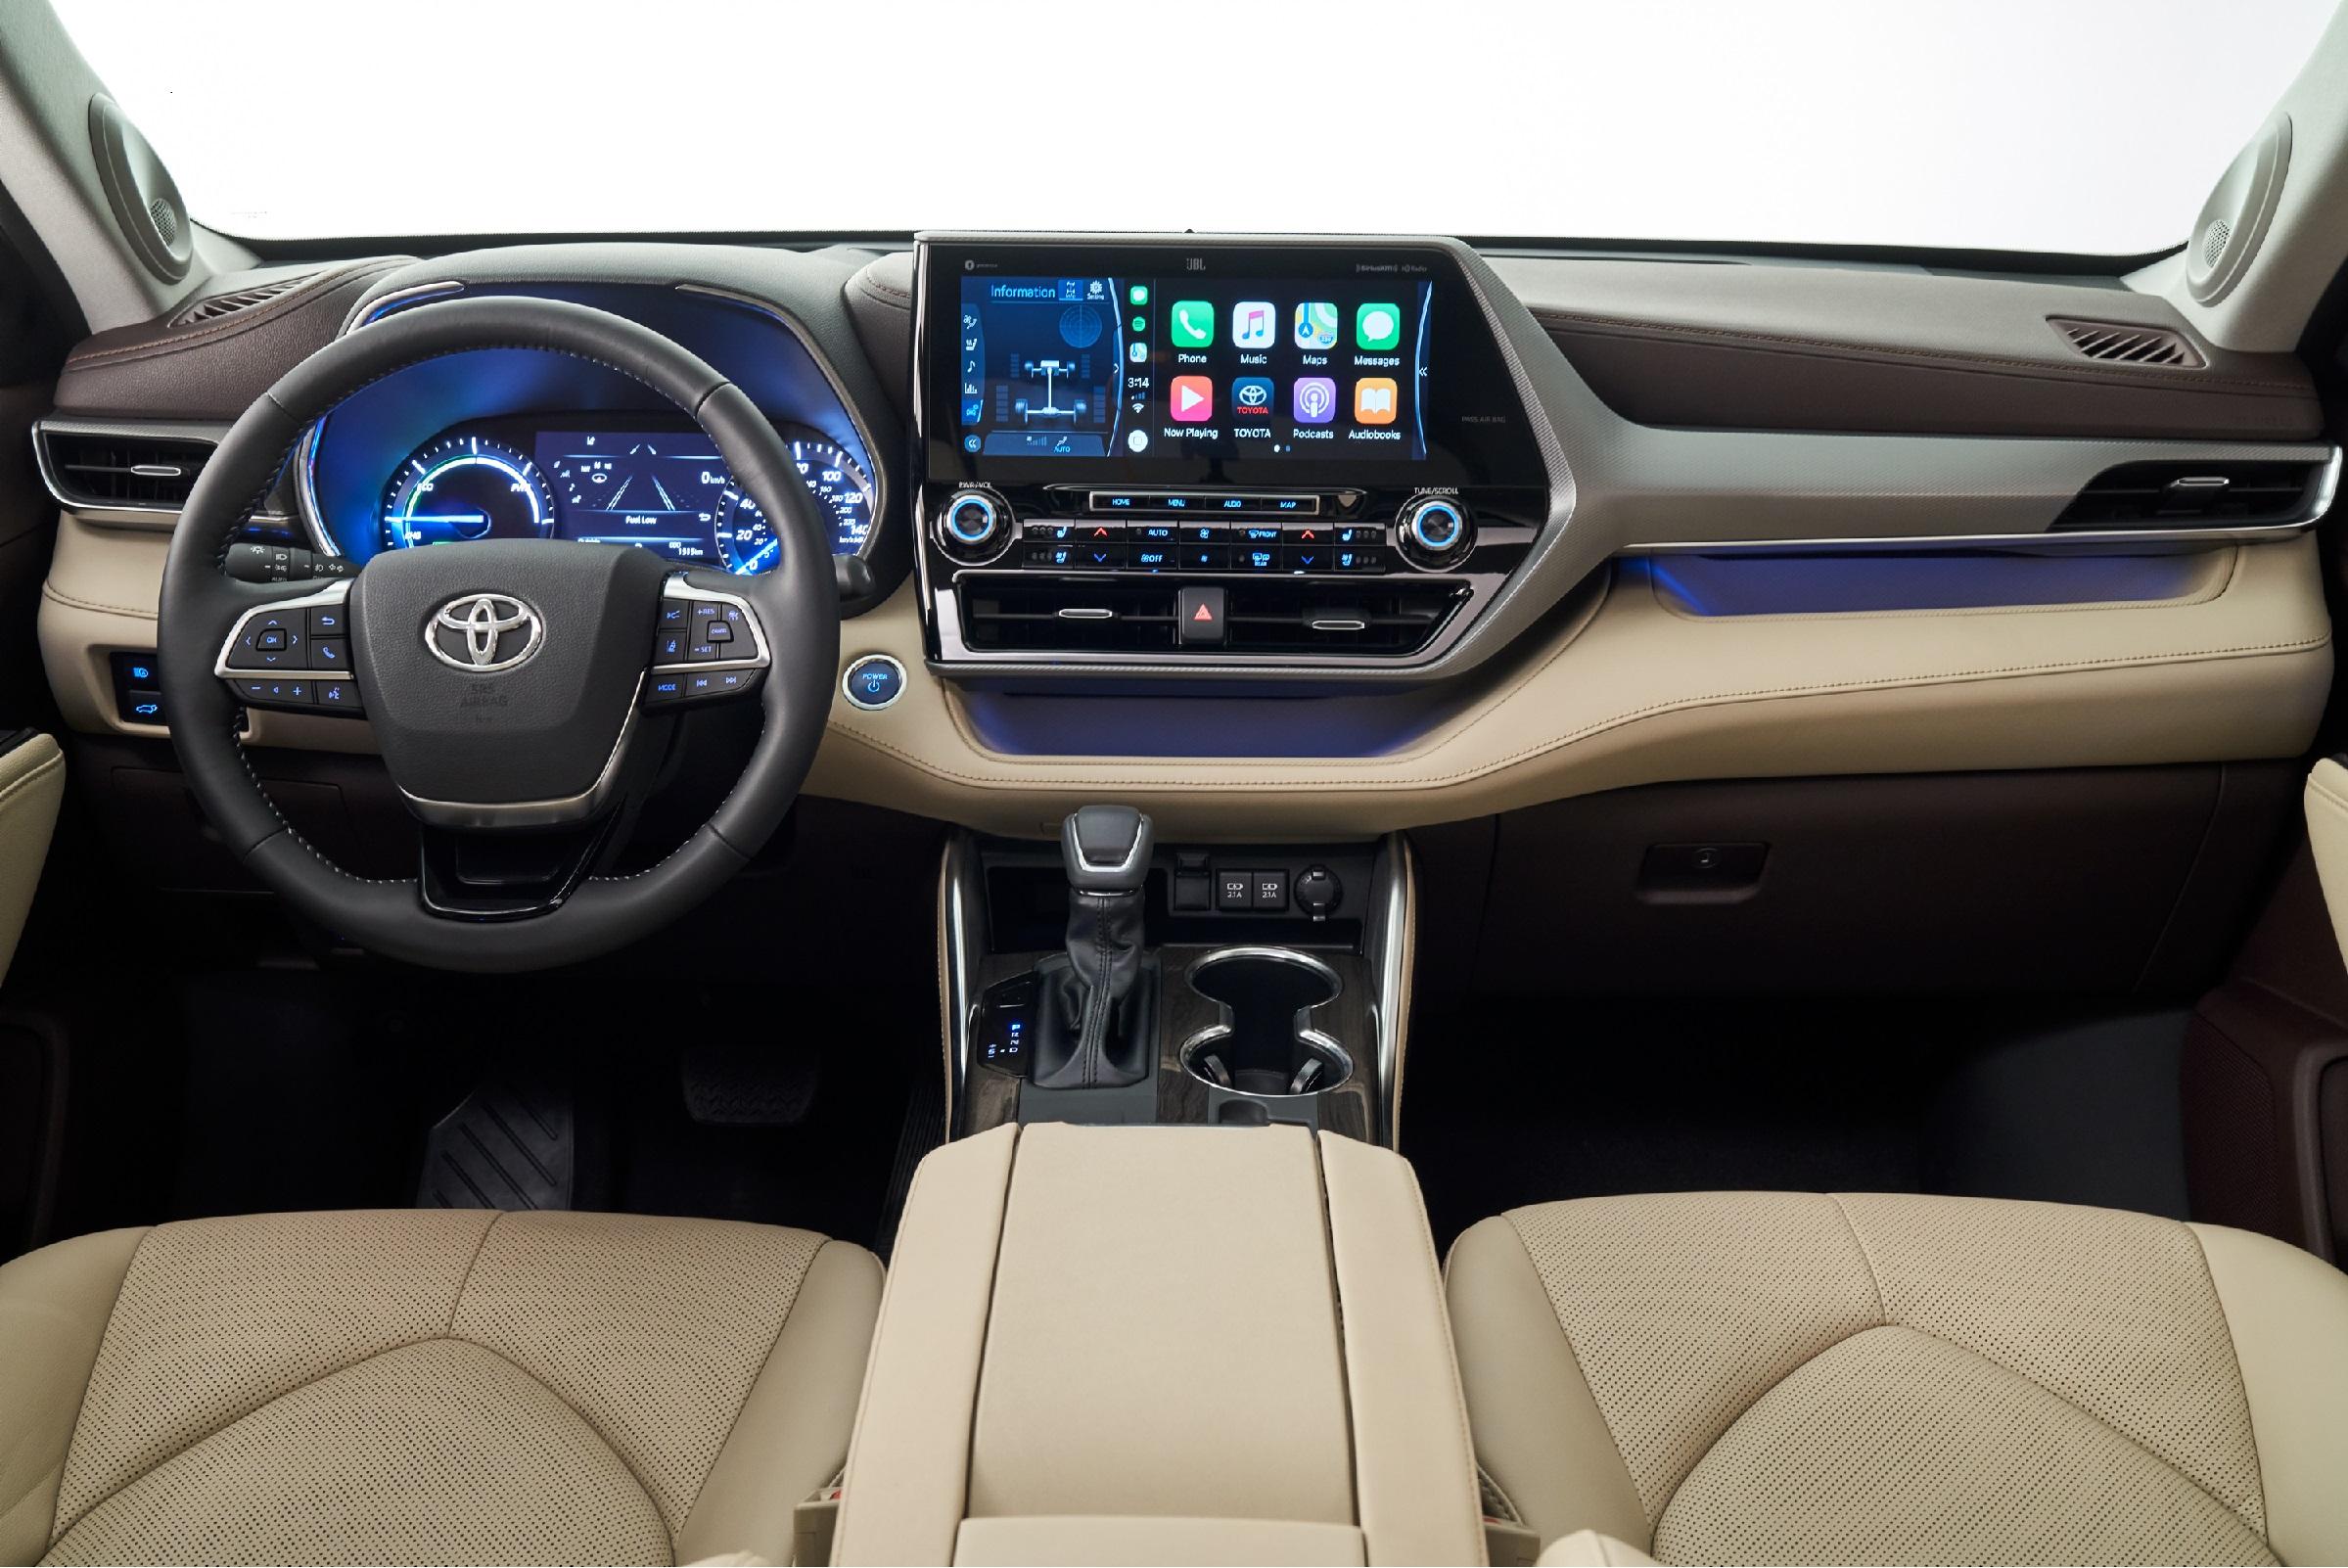 Smartphone Integration in the 2020 Toyota Highlander